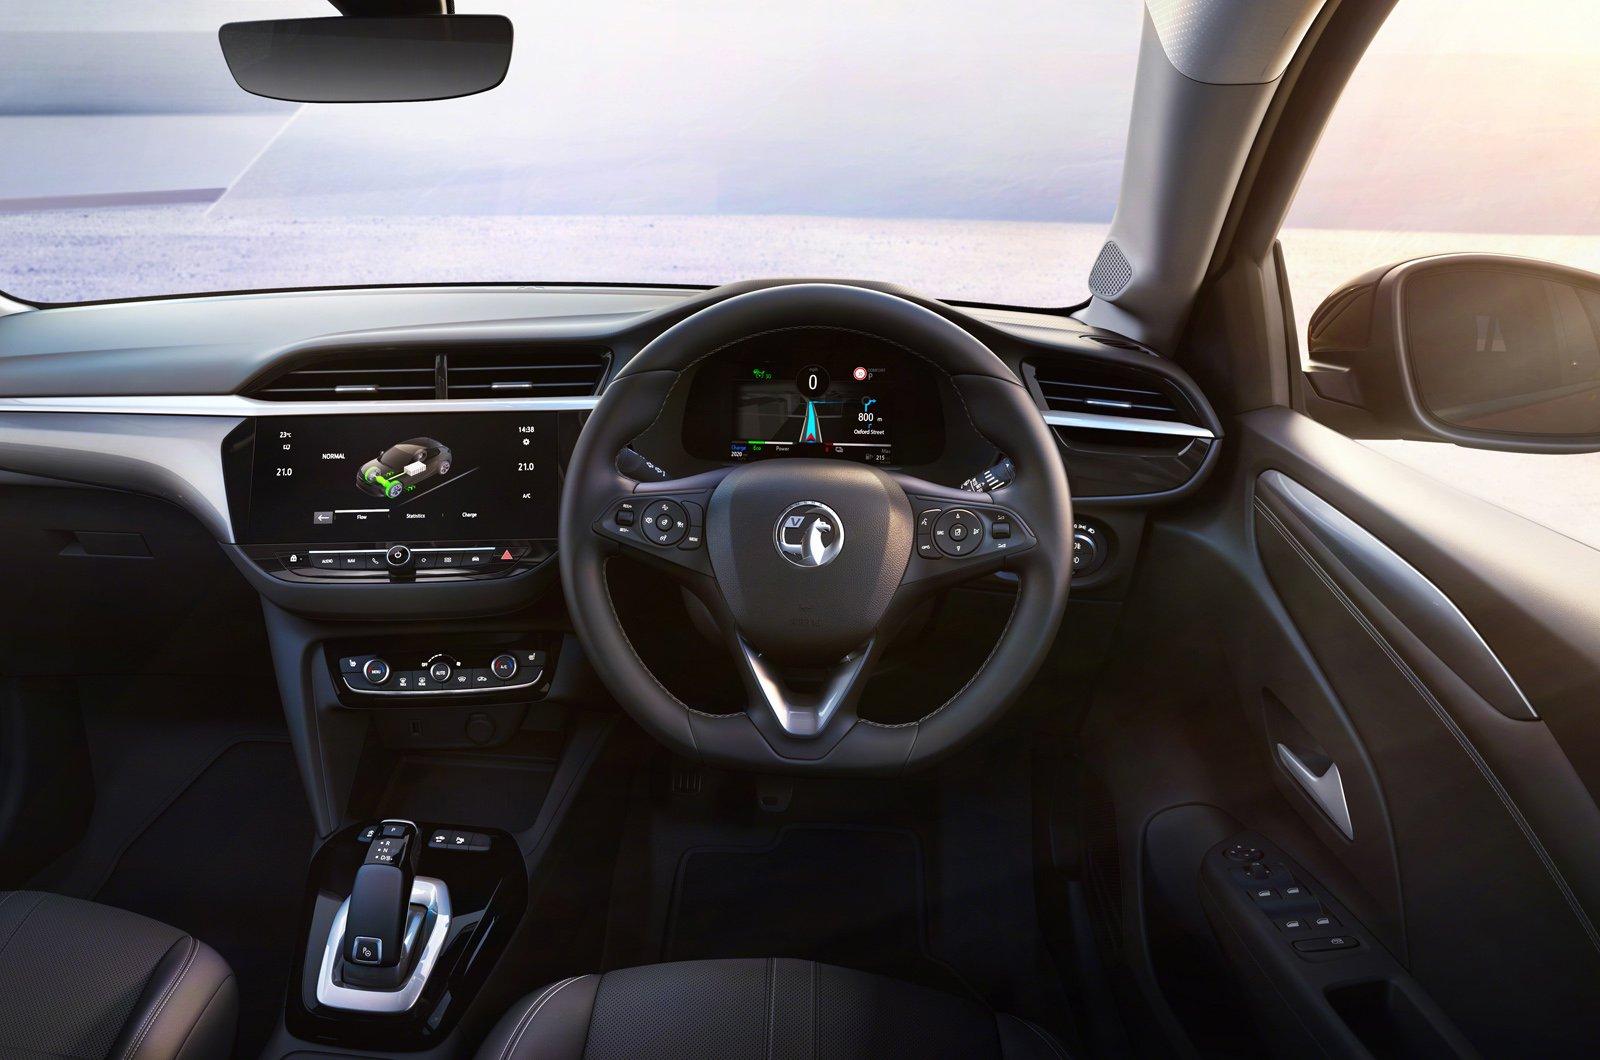 Vauxhall eCorsa dashboard